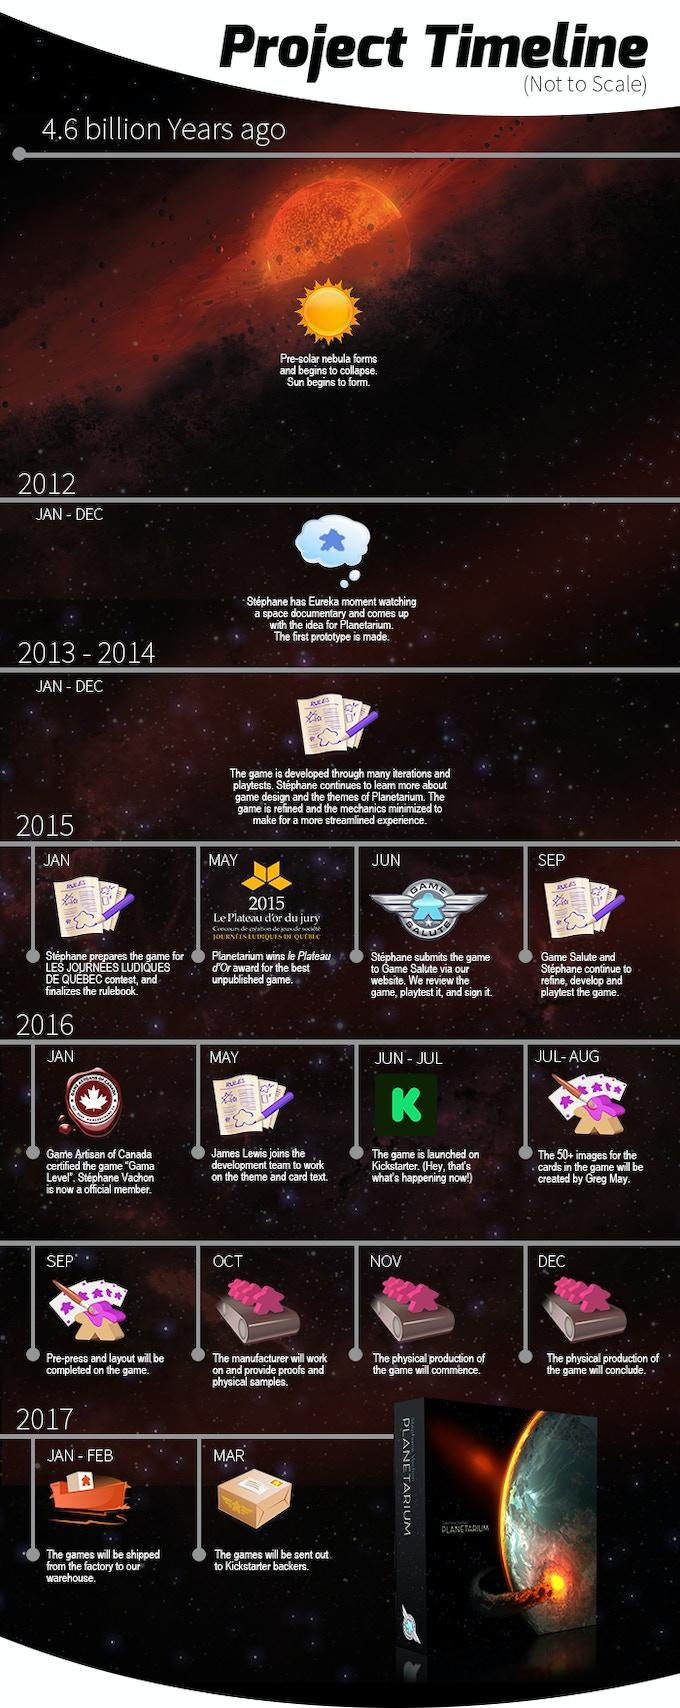 Planetarium by Game Salute — Kickstarter